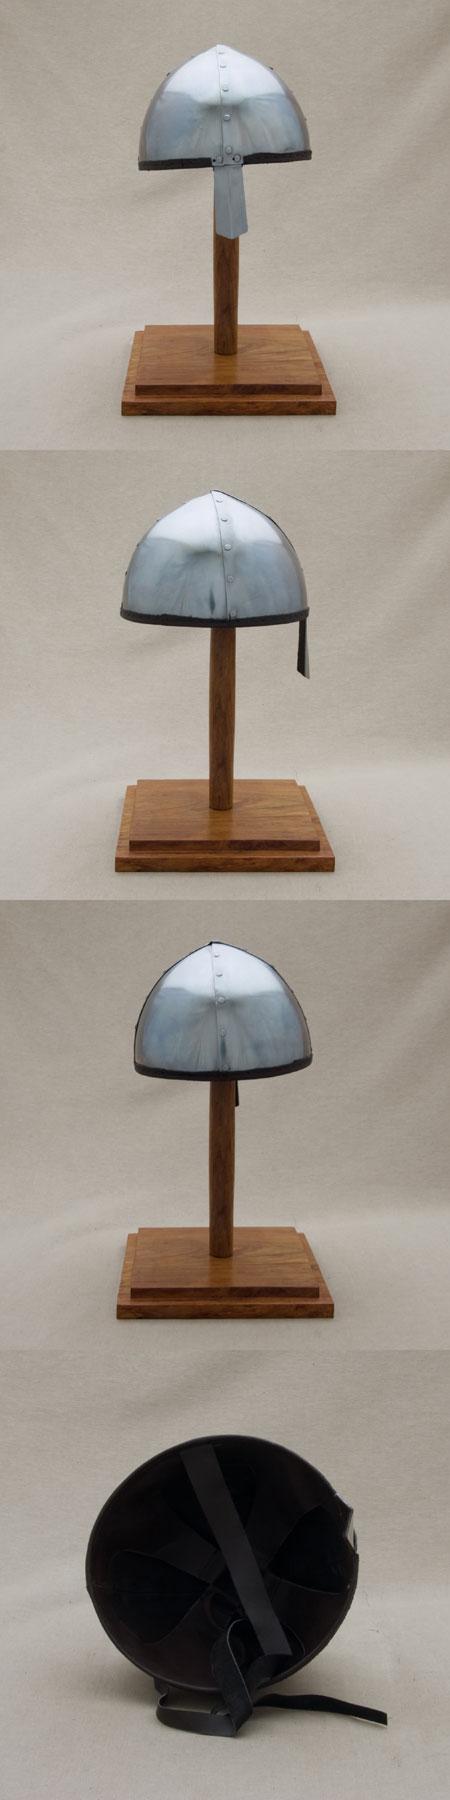 Norman Helmet or Viking Helmet w. nose guard